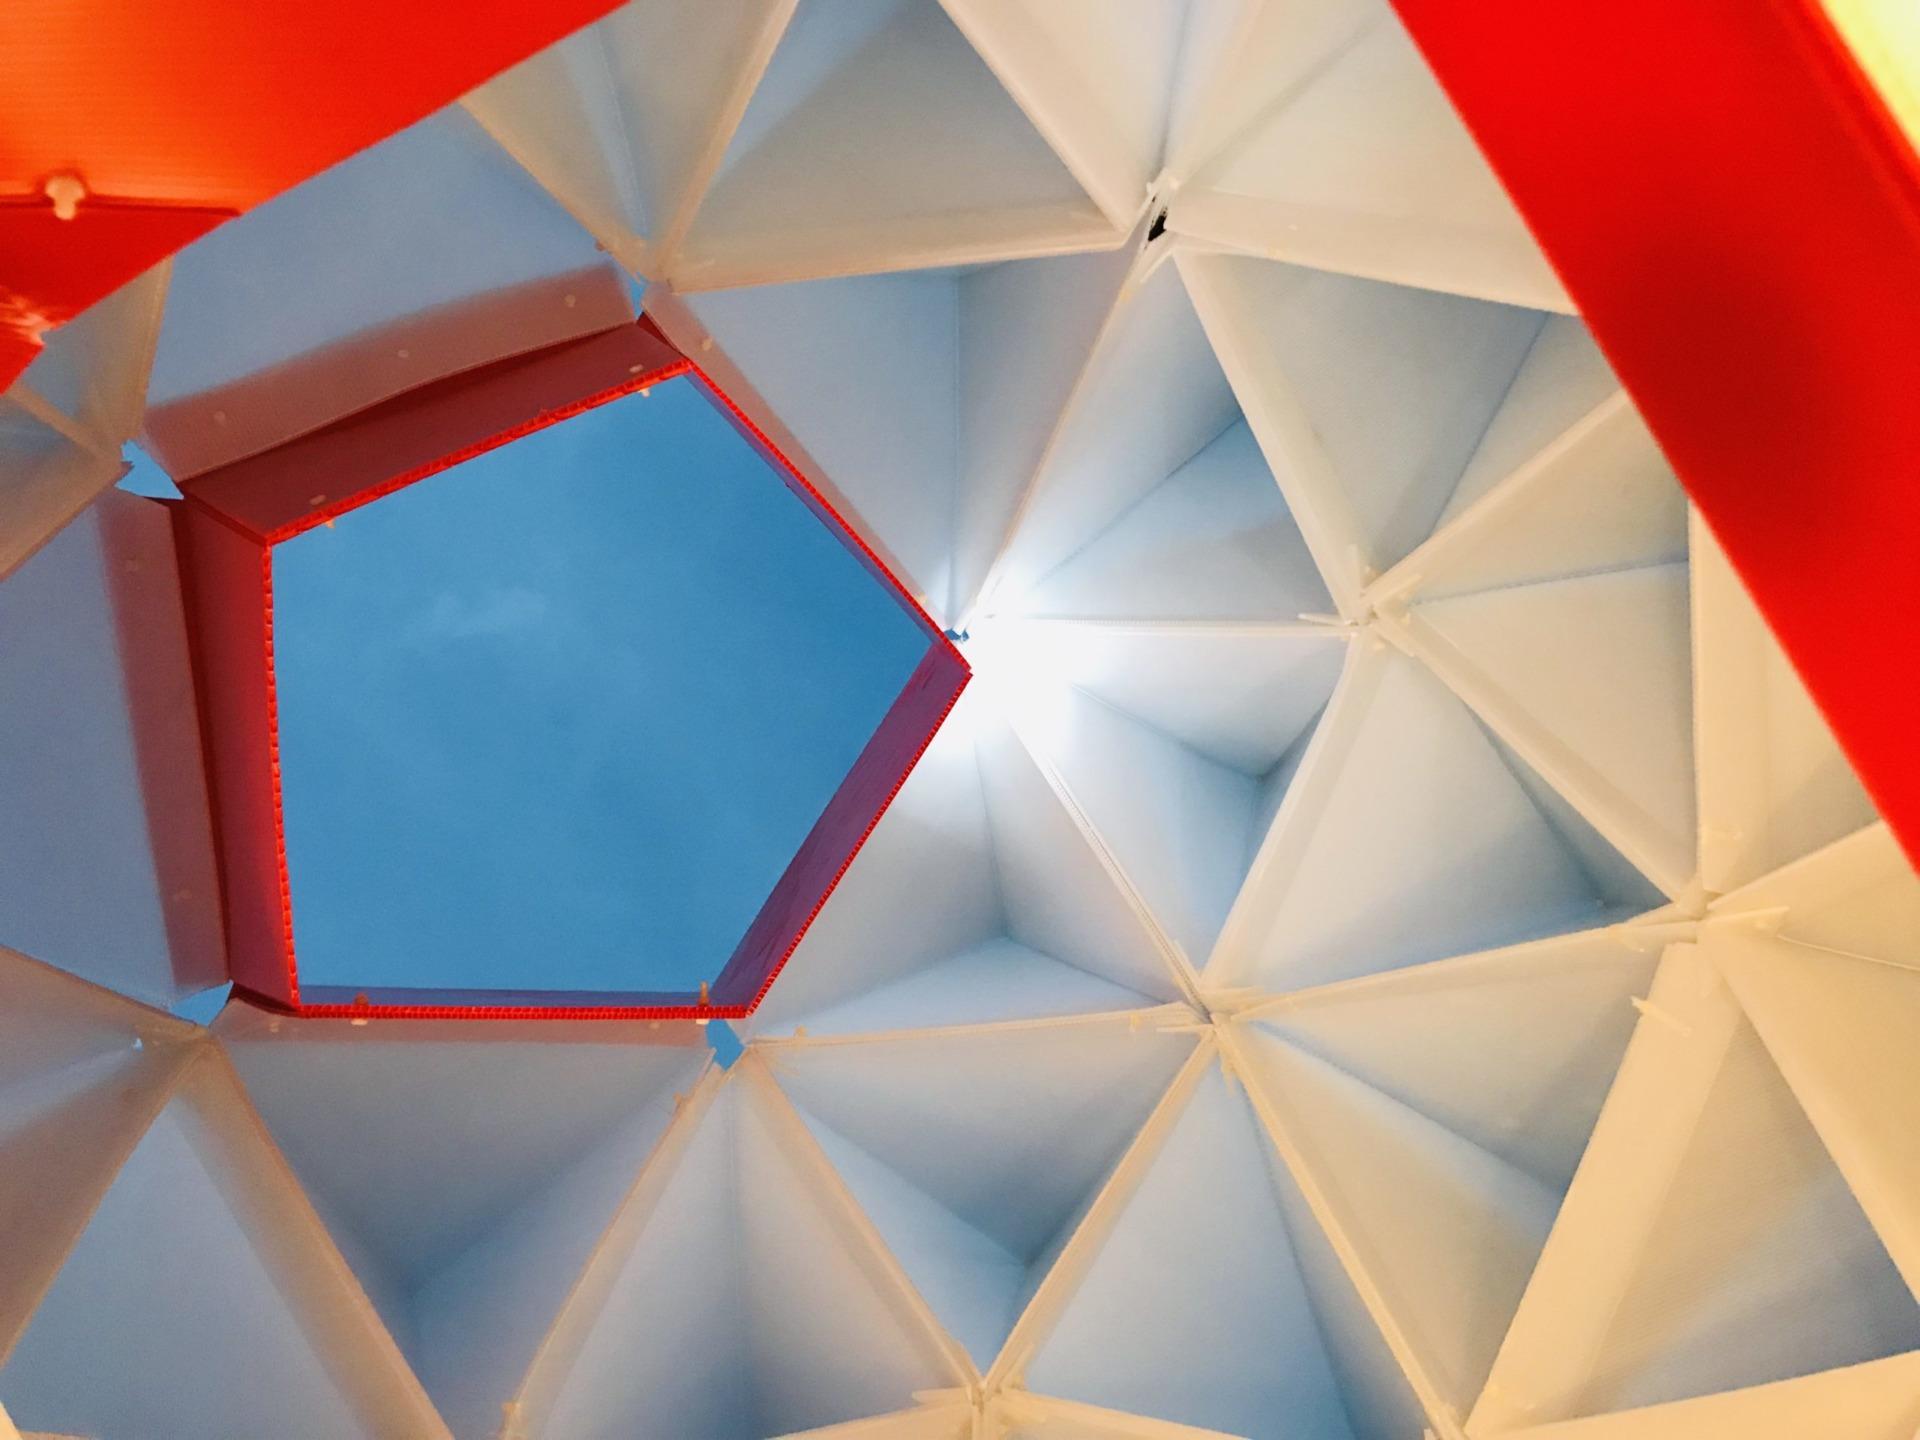 Sala Ferusic Architects Durian Carles Sala Relja Ferusic